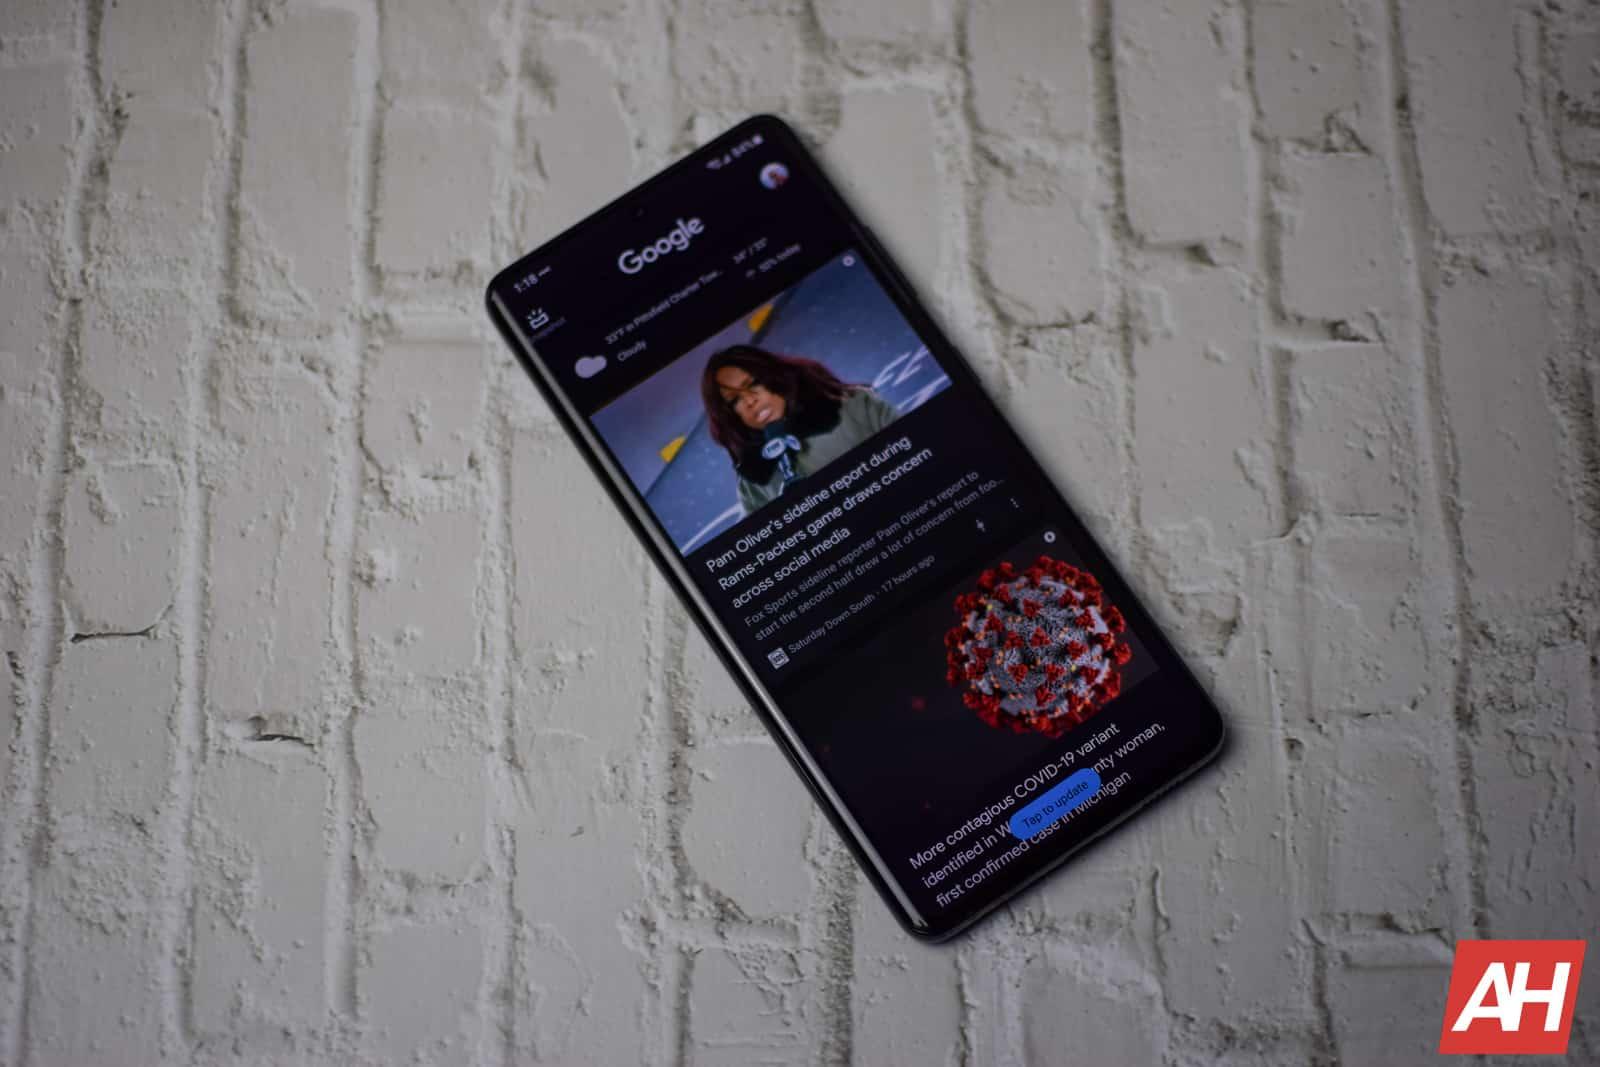 Samsung Galaxy S21 Ultra AH 09